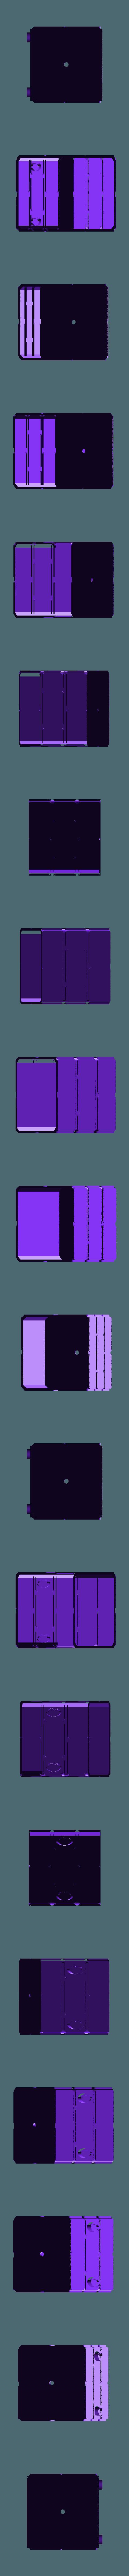 blockPlanter.stl Download free STL file Mario Brick Planter • 3D print design, Adafruit